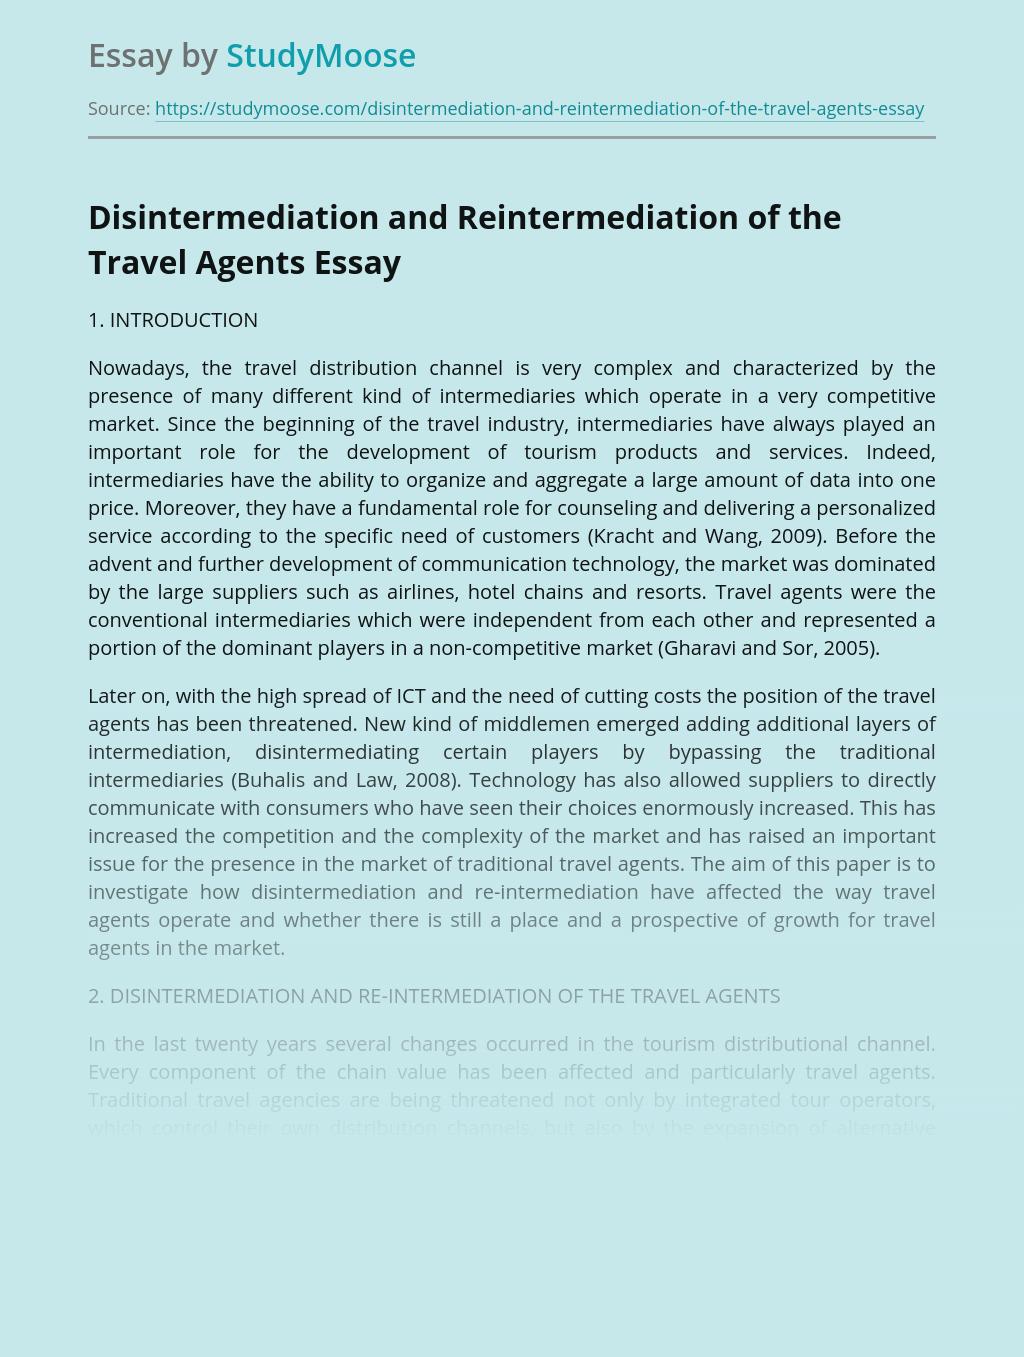 Disintermediation and Reintermediation of the Travel Agents